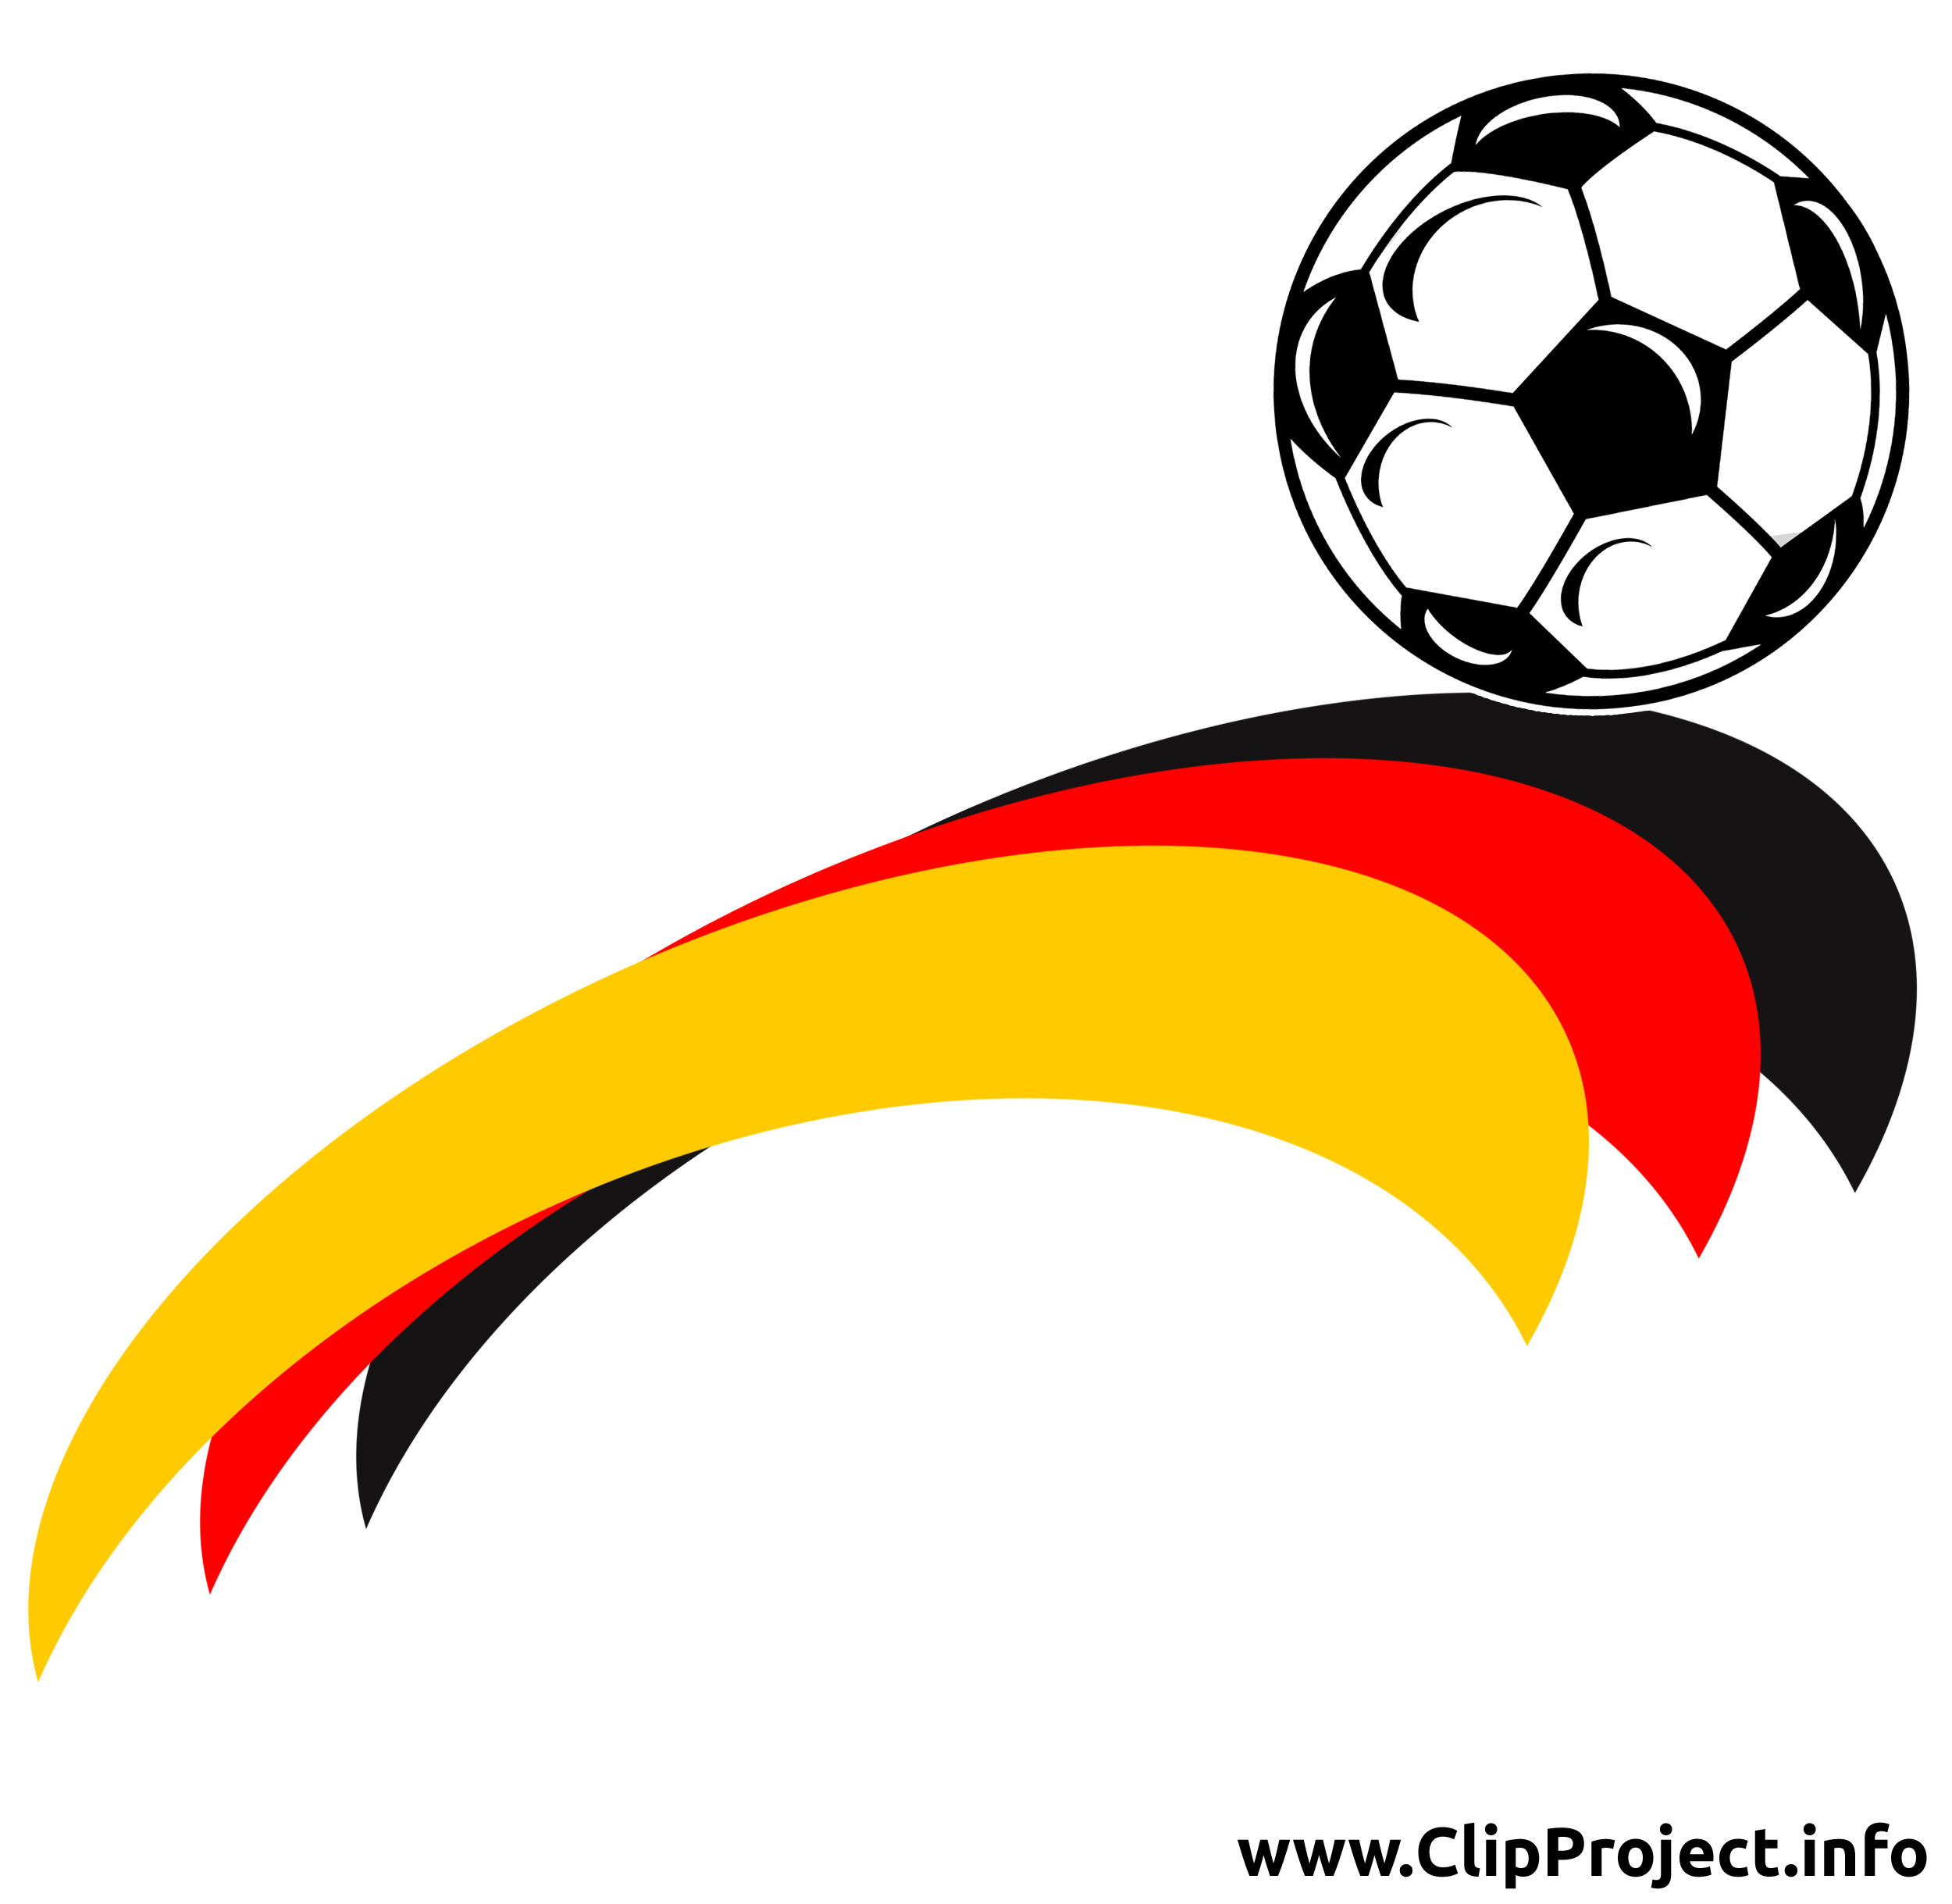 Dessin gratuit football image